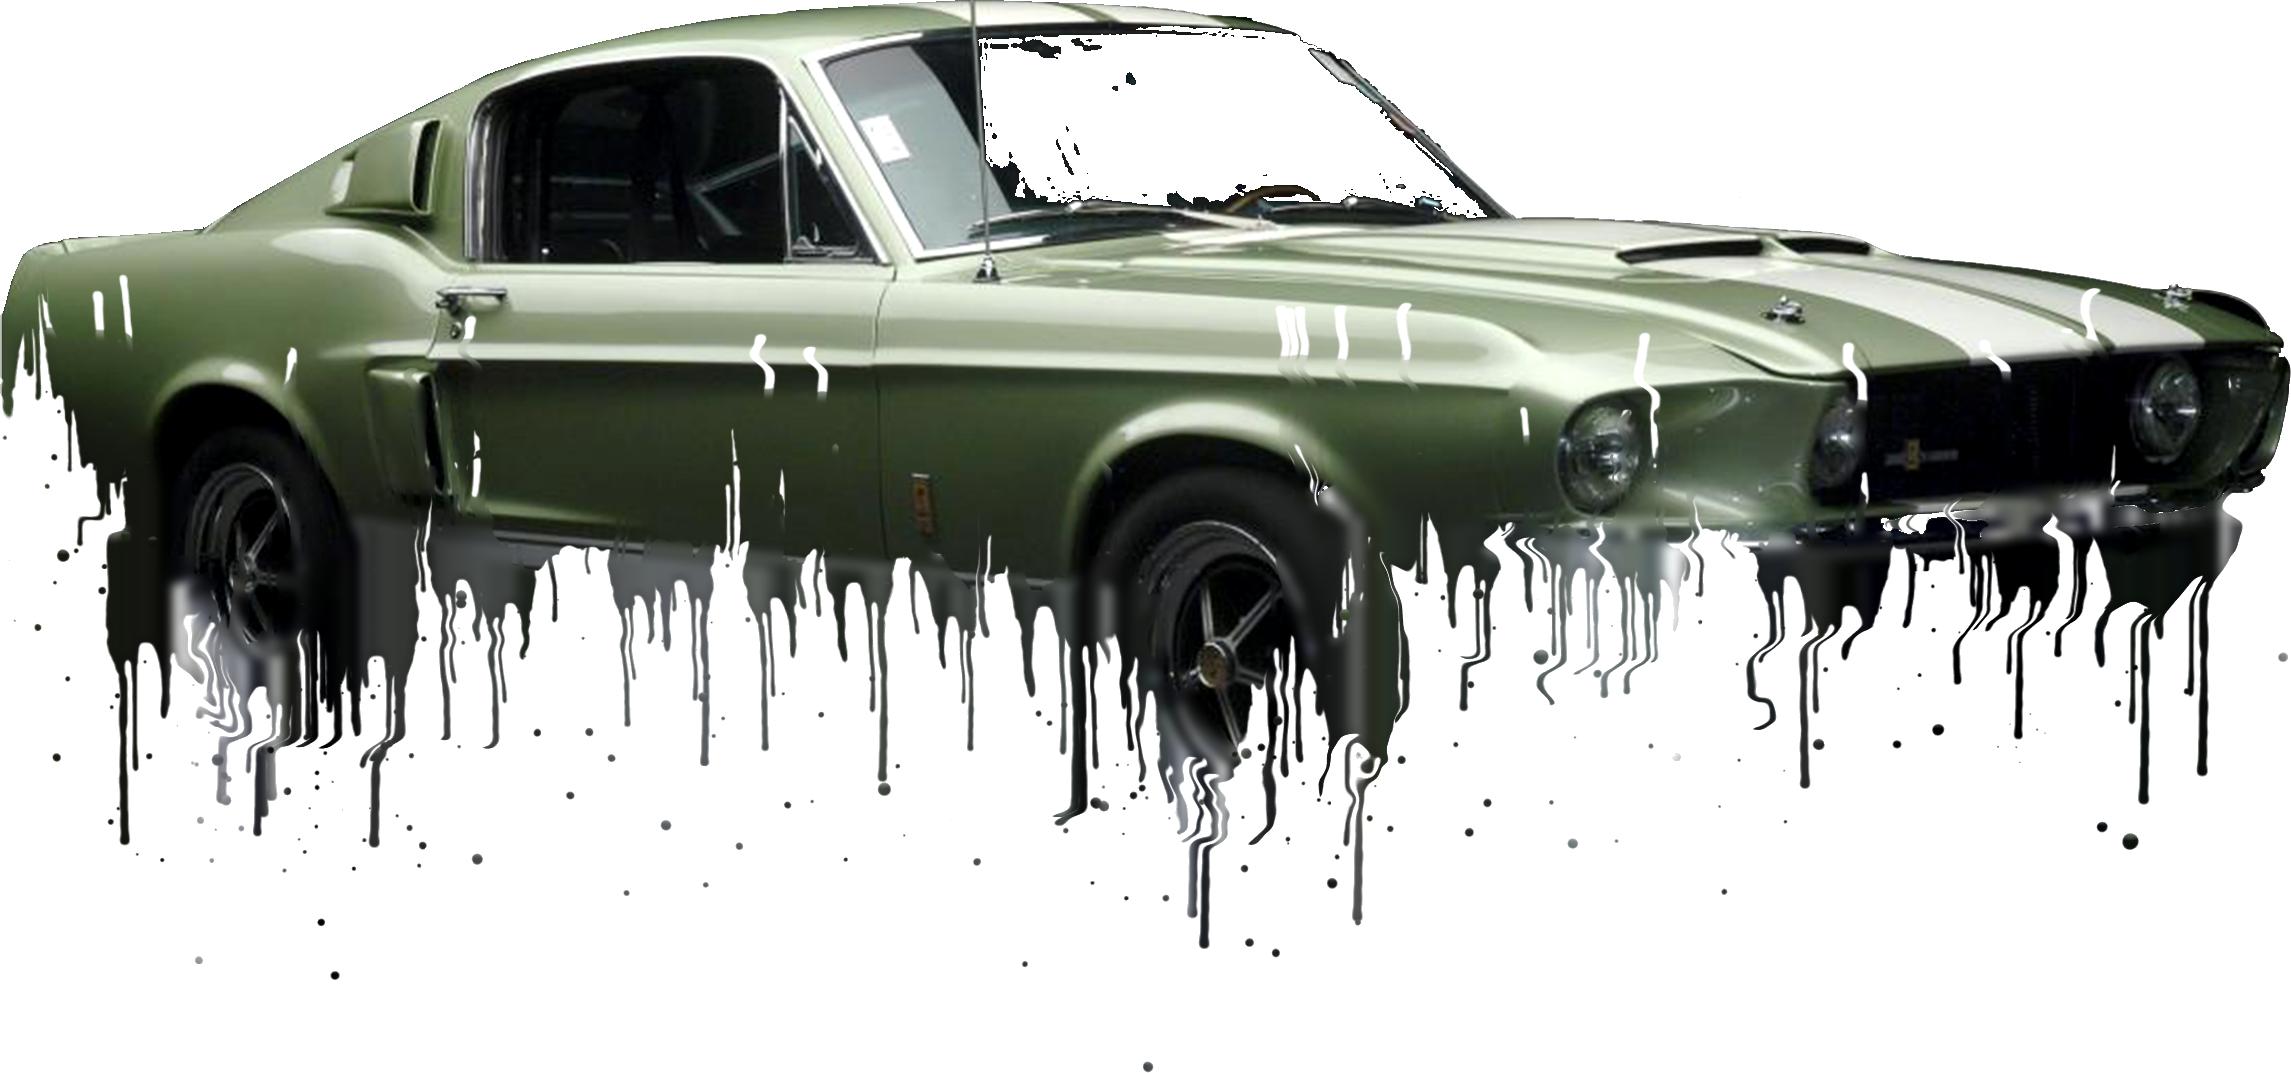 Shelby Mustang Liquid Metal